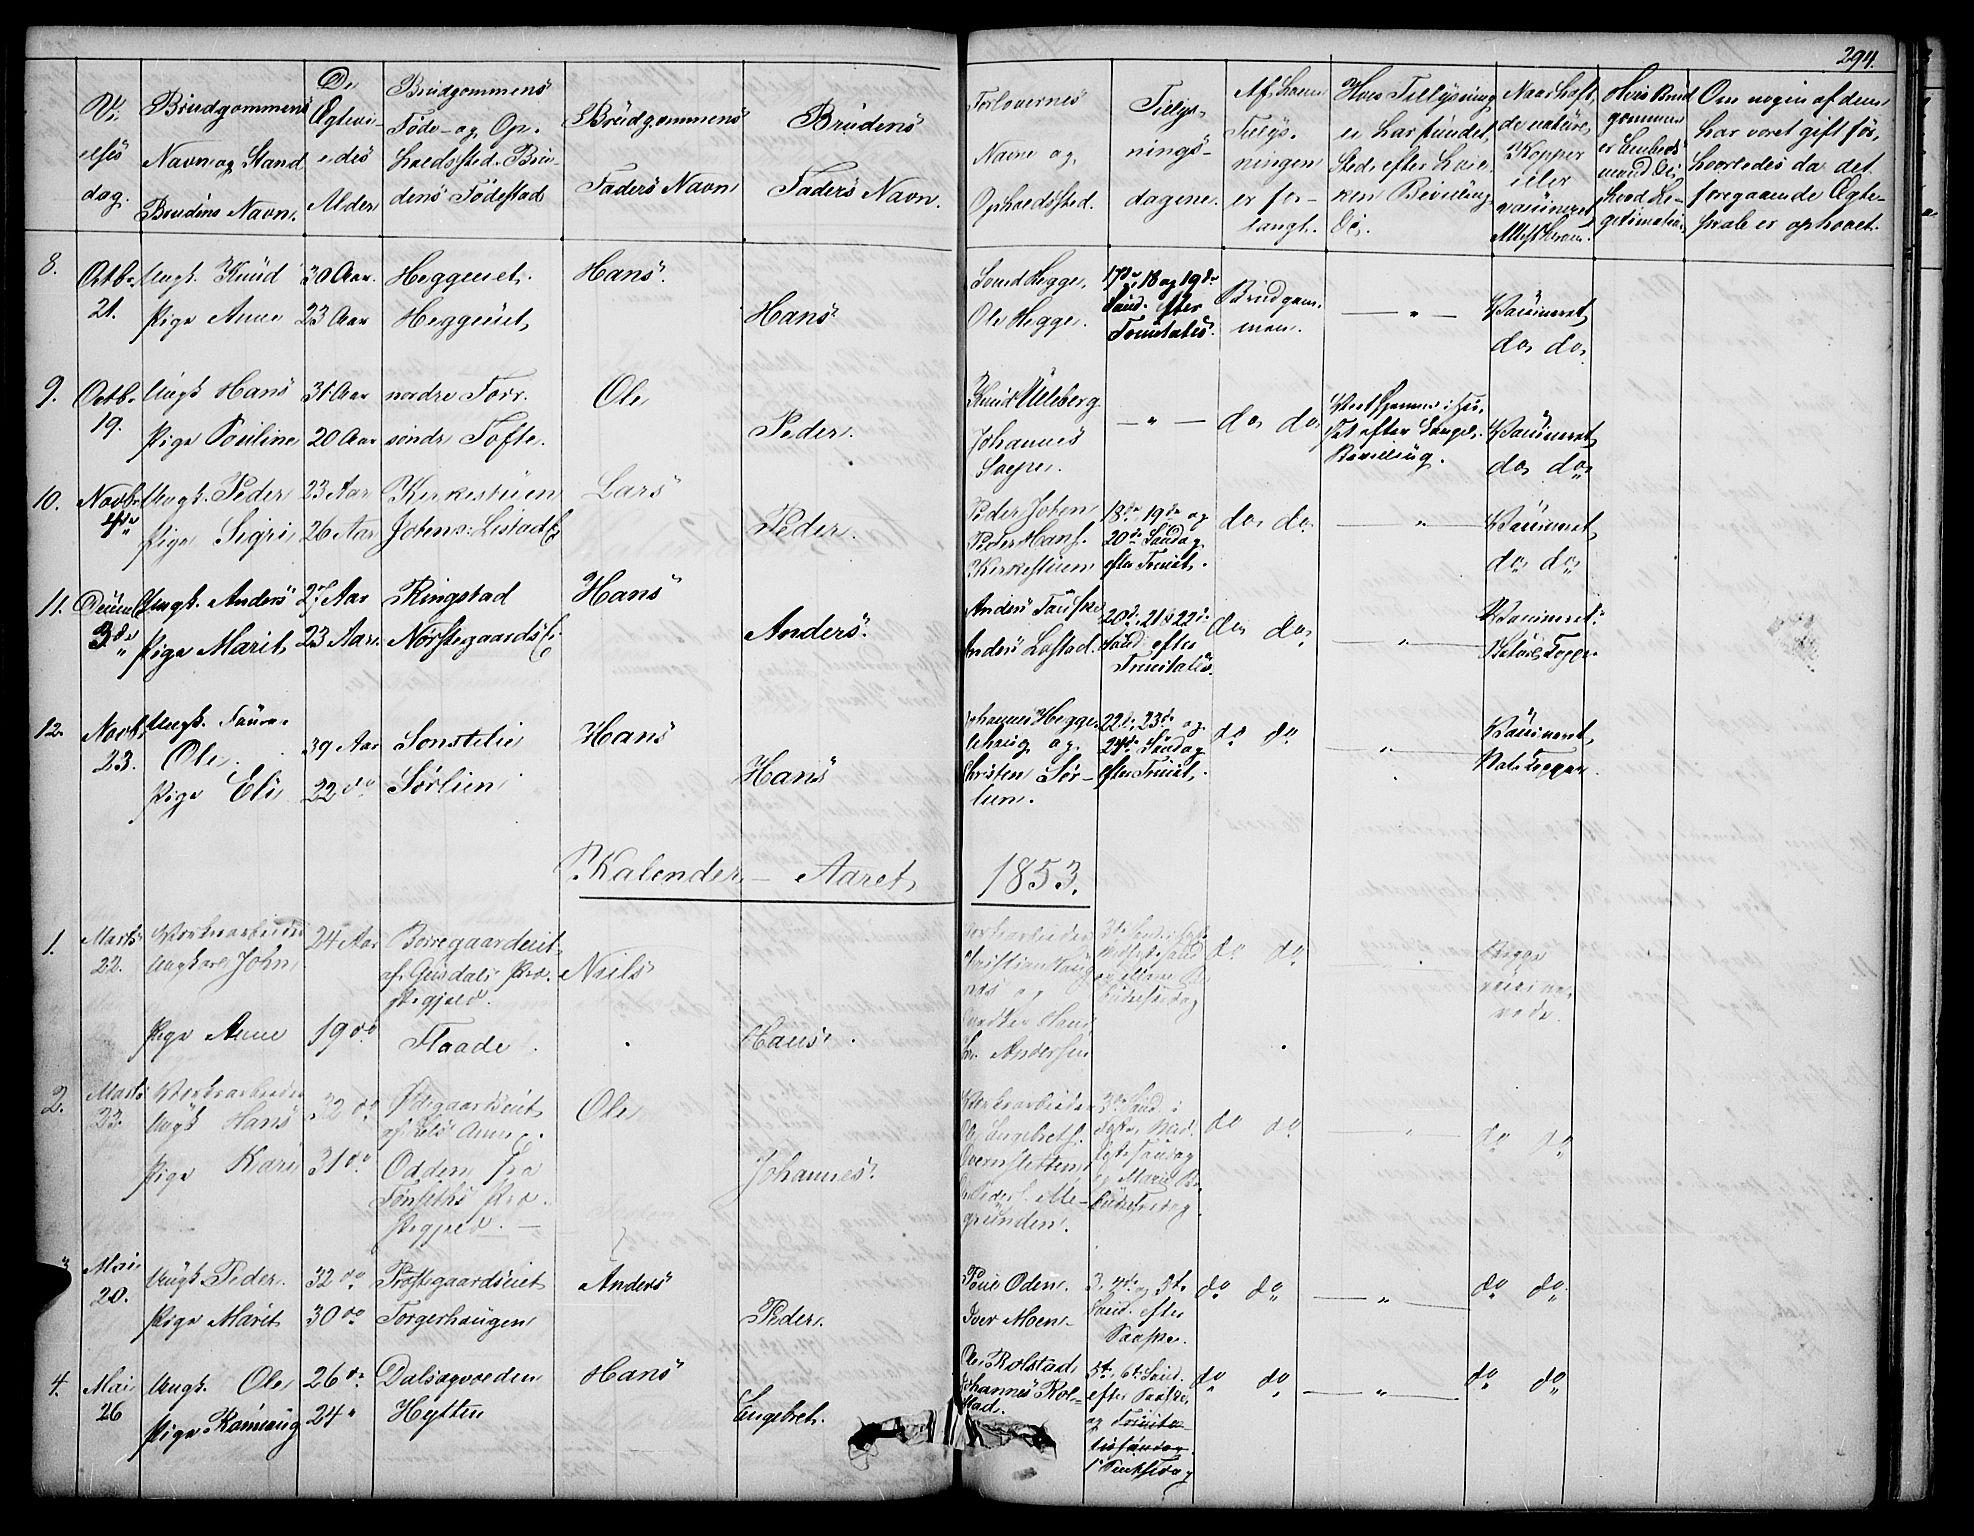 SAH, Sør-Fron prestekontor, H/Ha/Hab/L0001: Klokkerbok nr. 1, 1844-1863, s. 294